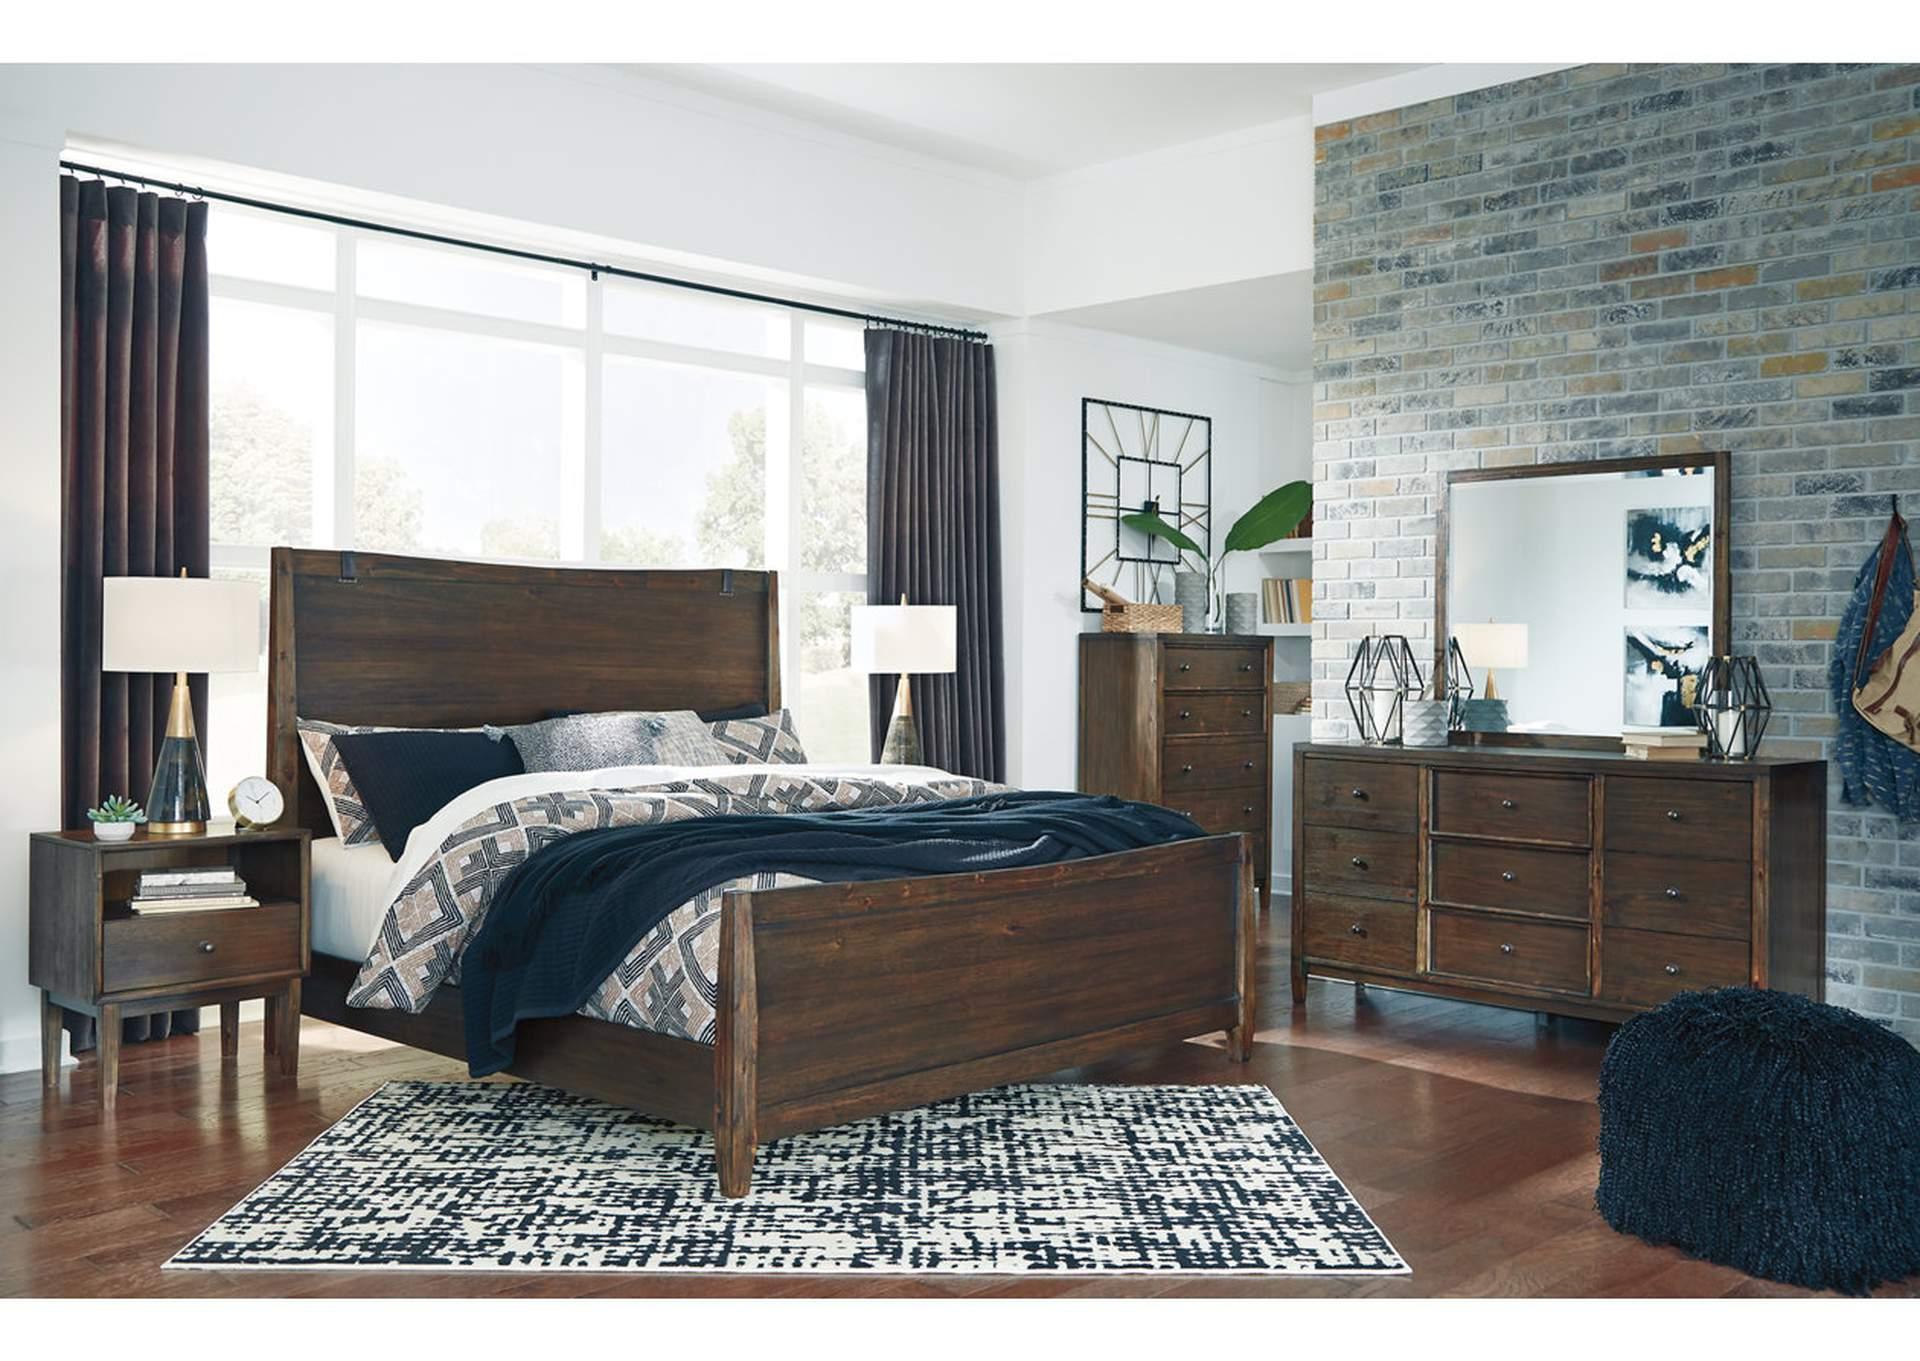 سرير + تسريحه + مرايا